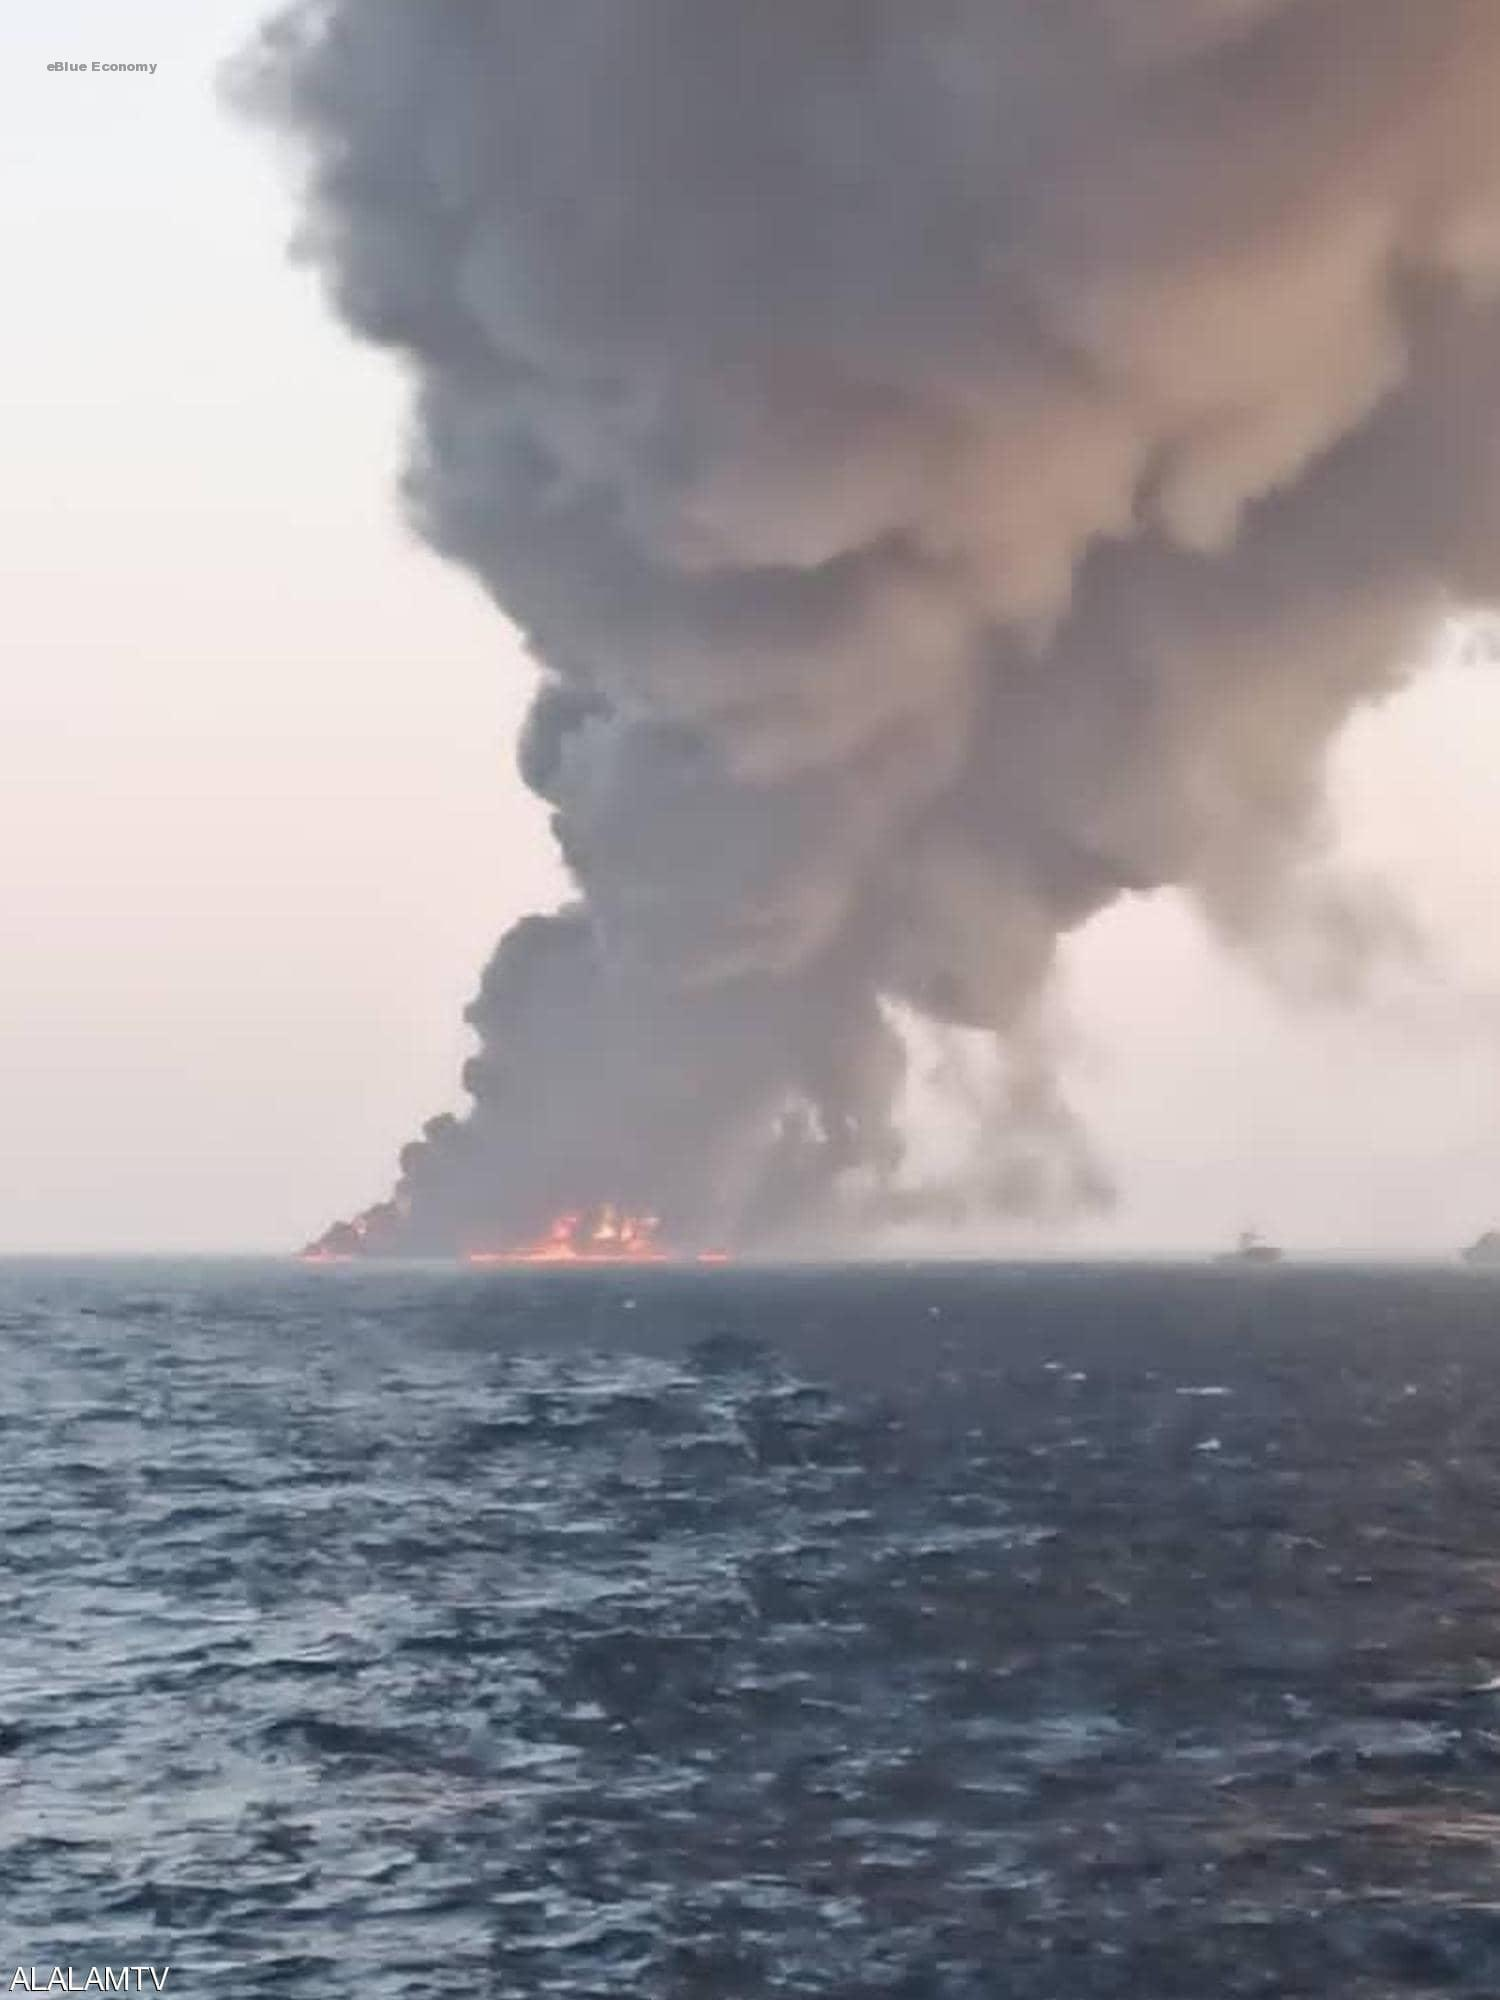 eBlue_economy_ غرق سفينة ايرانية بعد اشتعال النيران بها